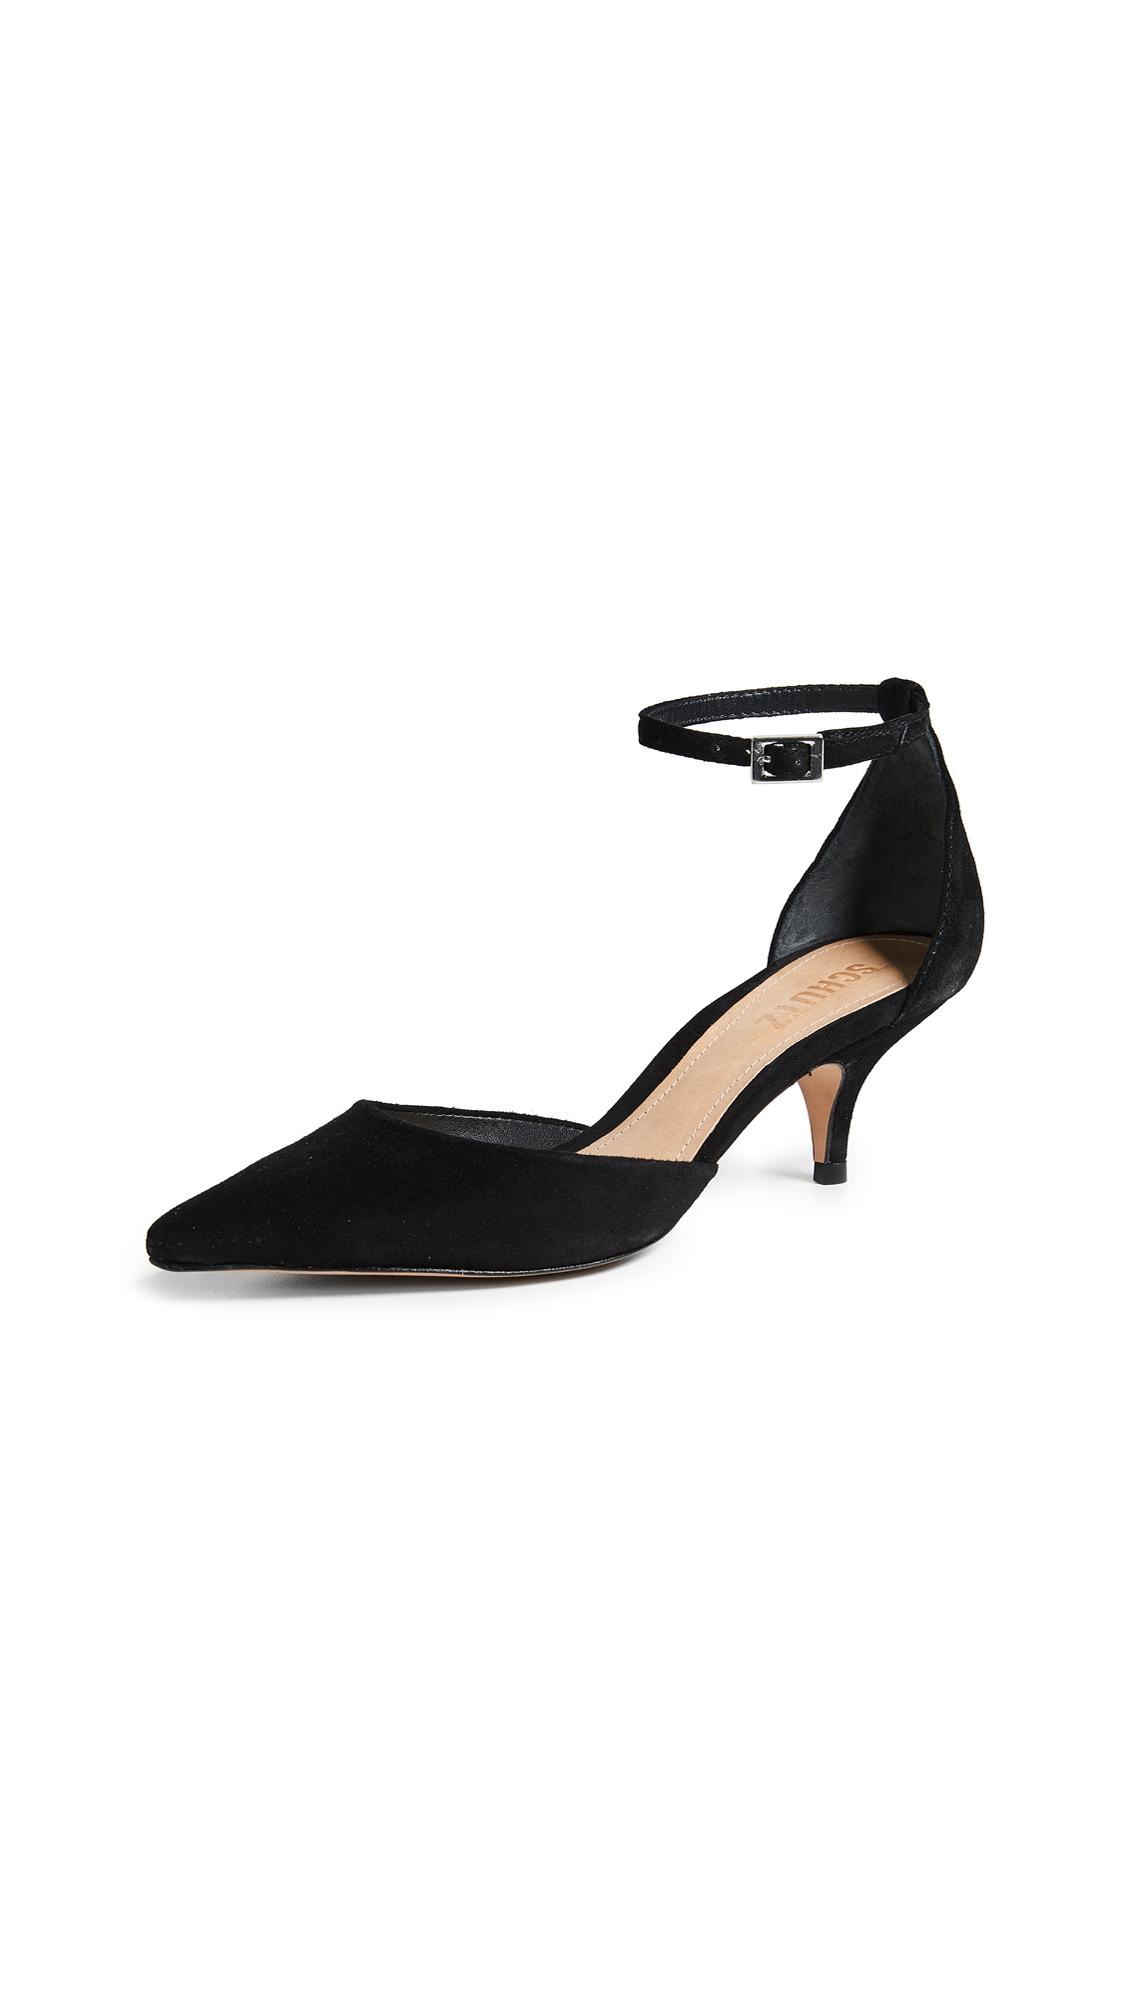 Schutz Kamilli Kitten Heels - Black